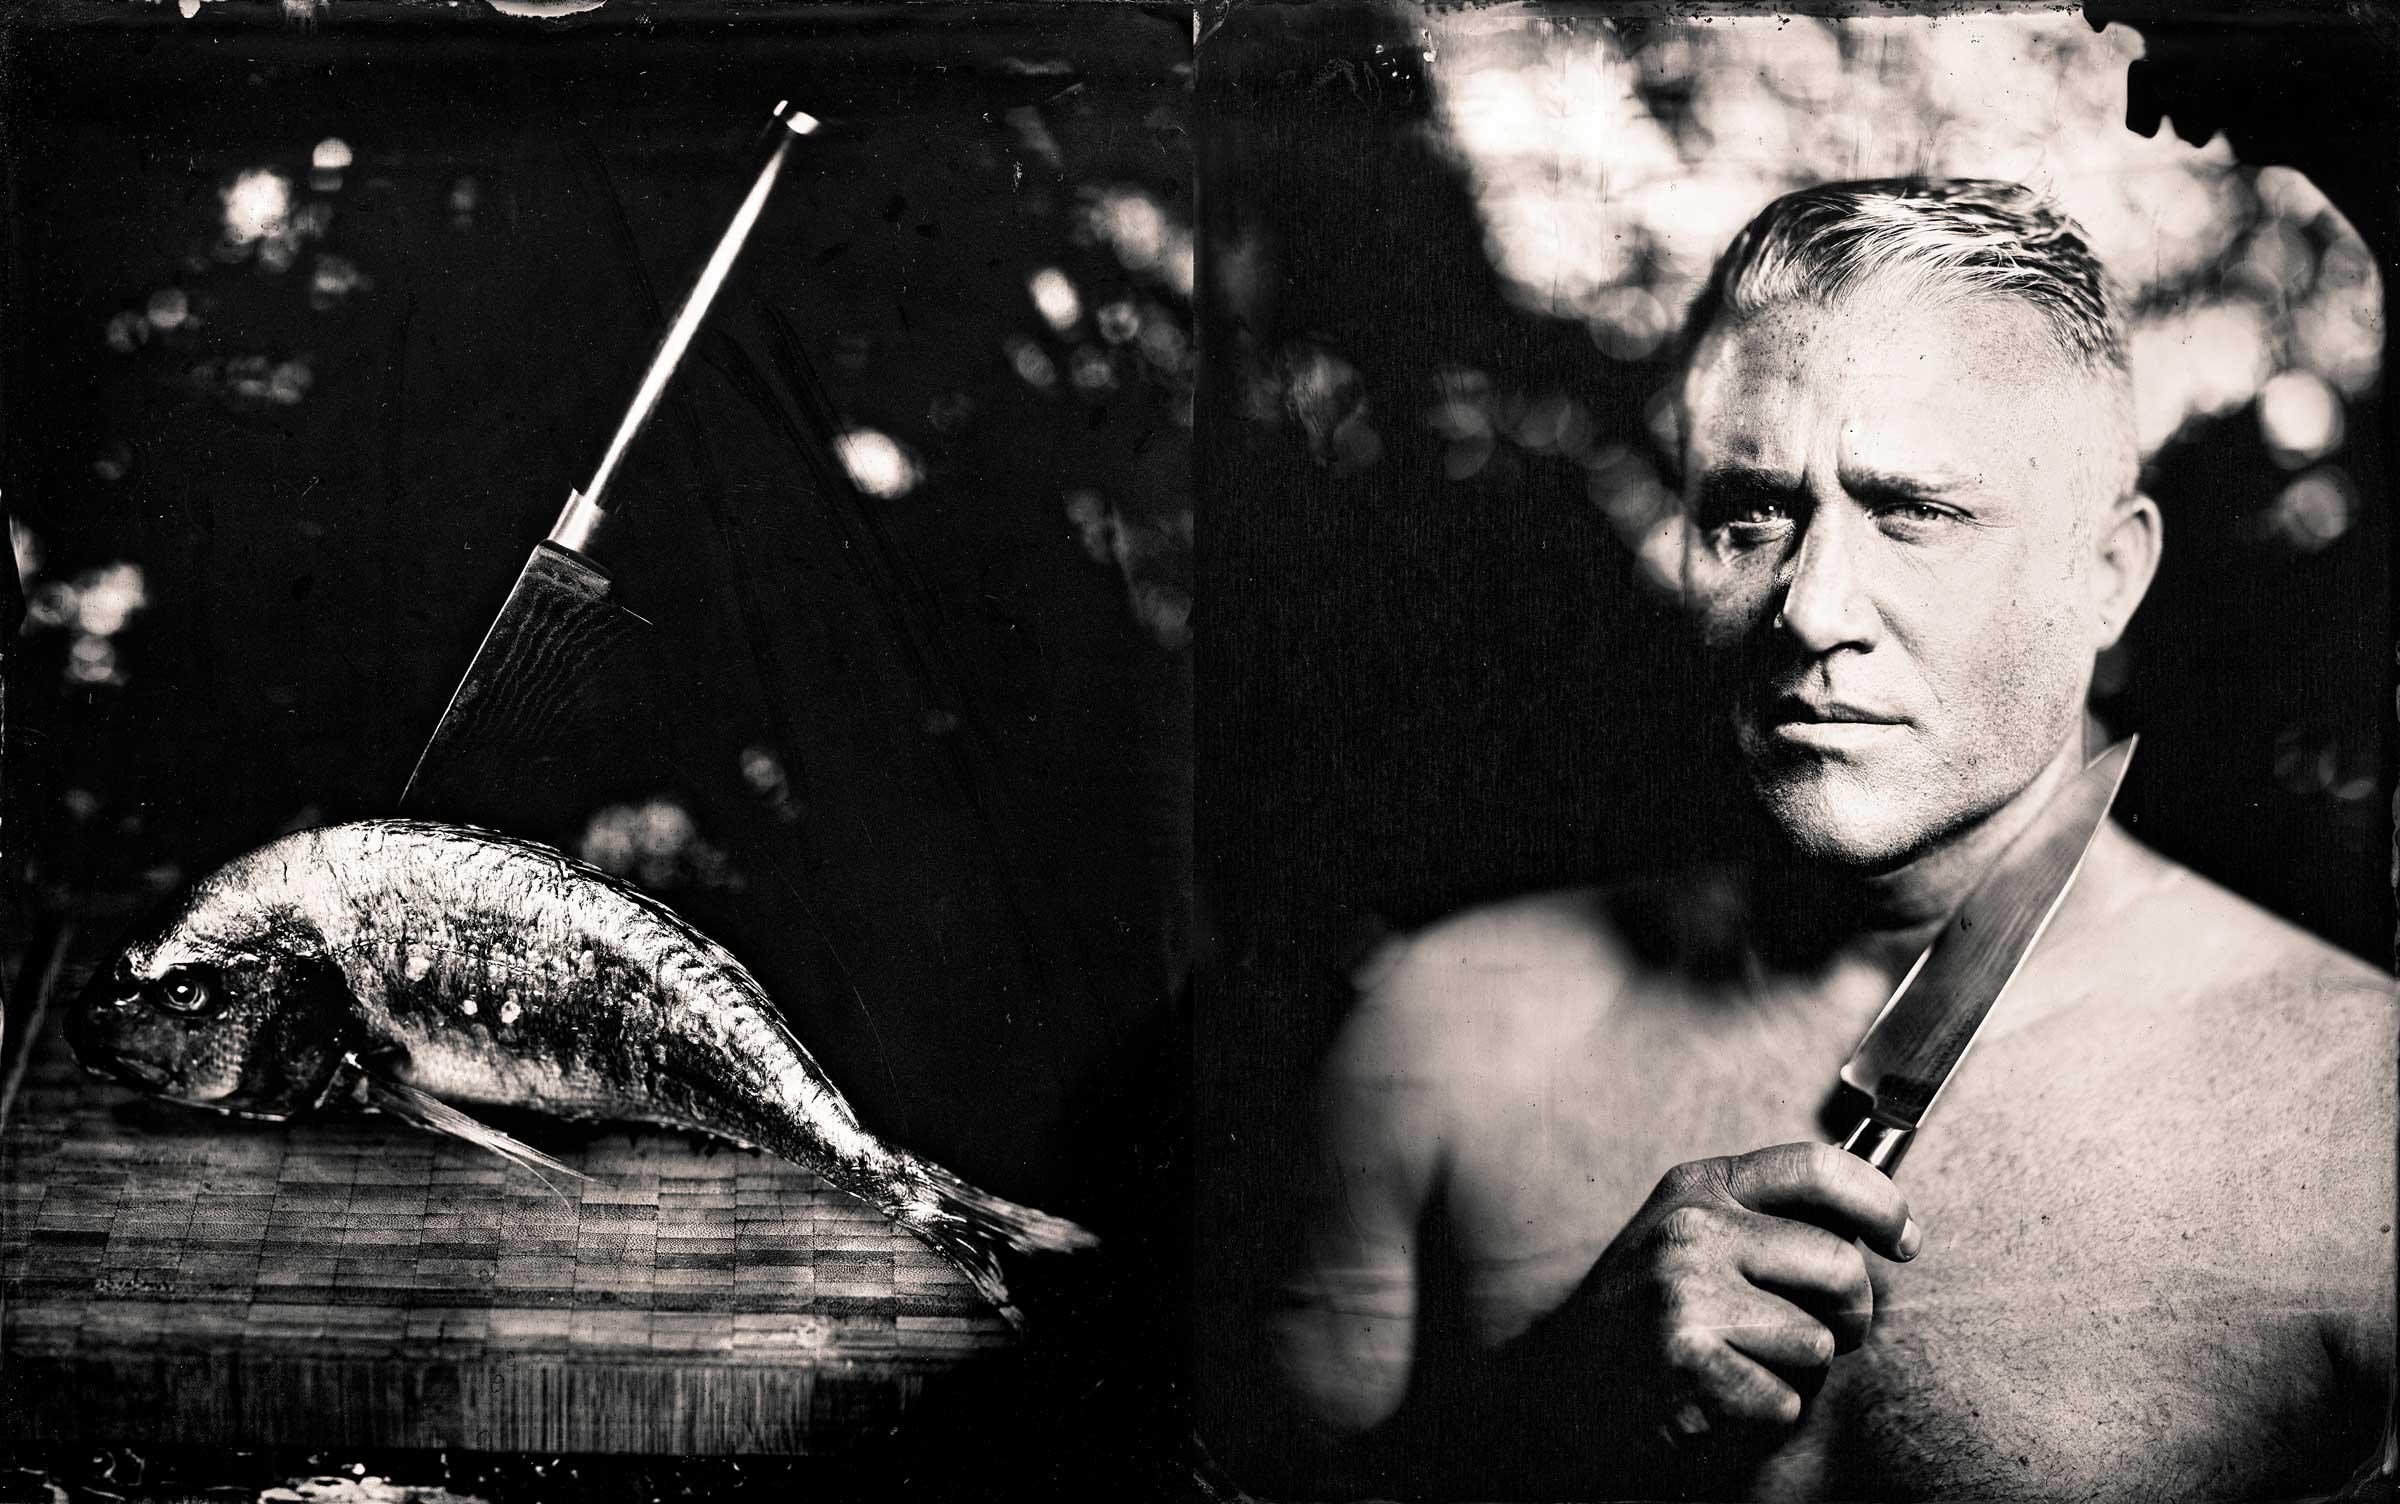 doug stabbed the fish